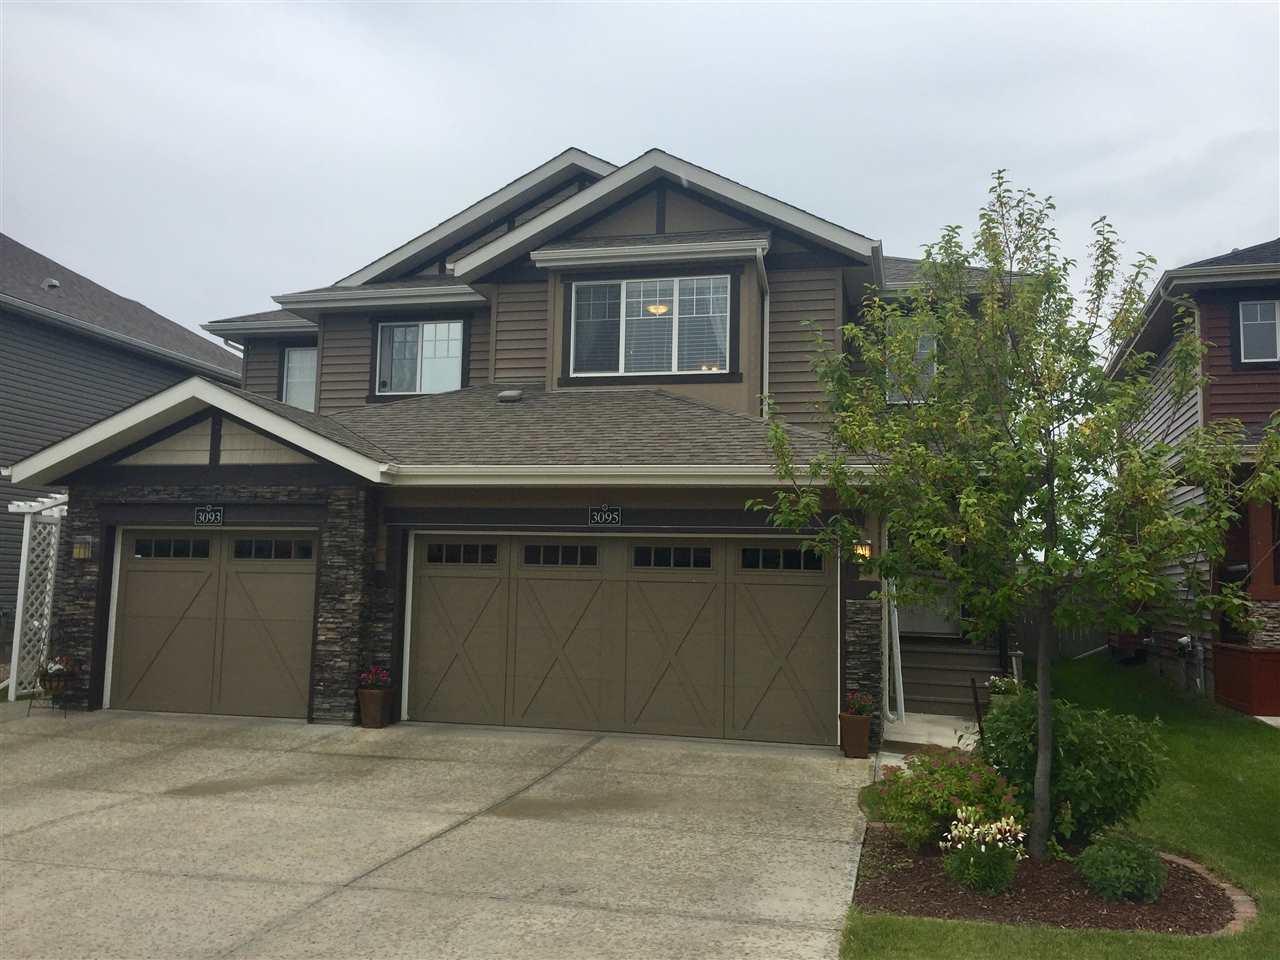 3095 WHITELAW Drive, Edmonton, AB T6W 0T7